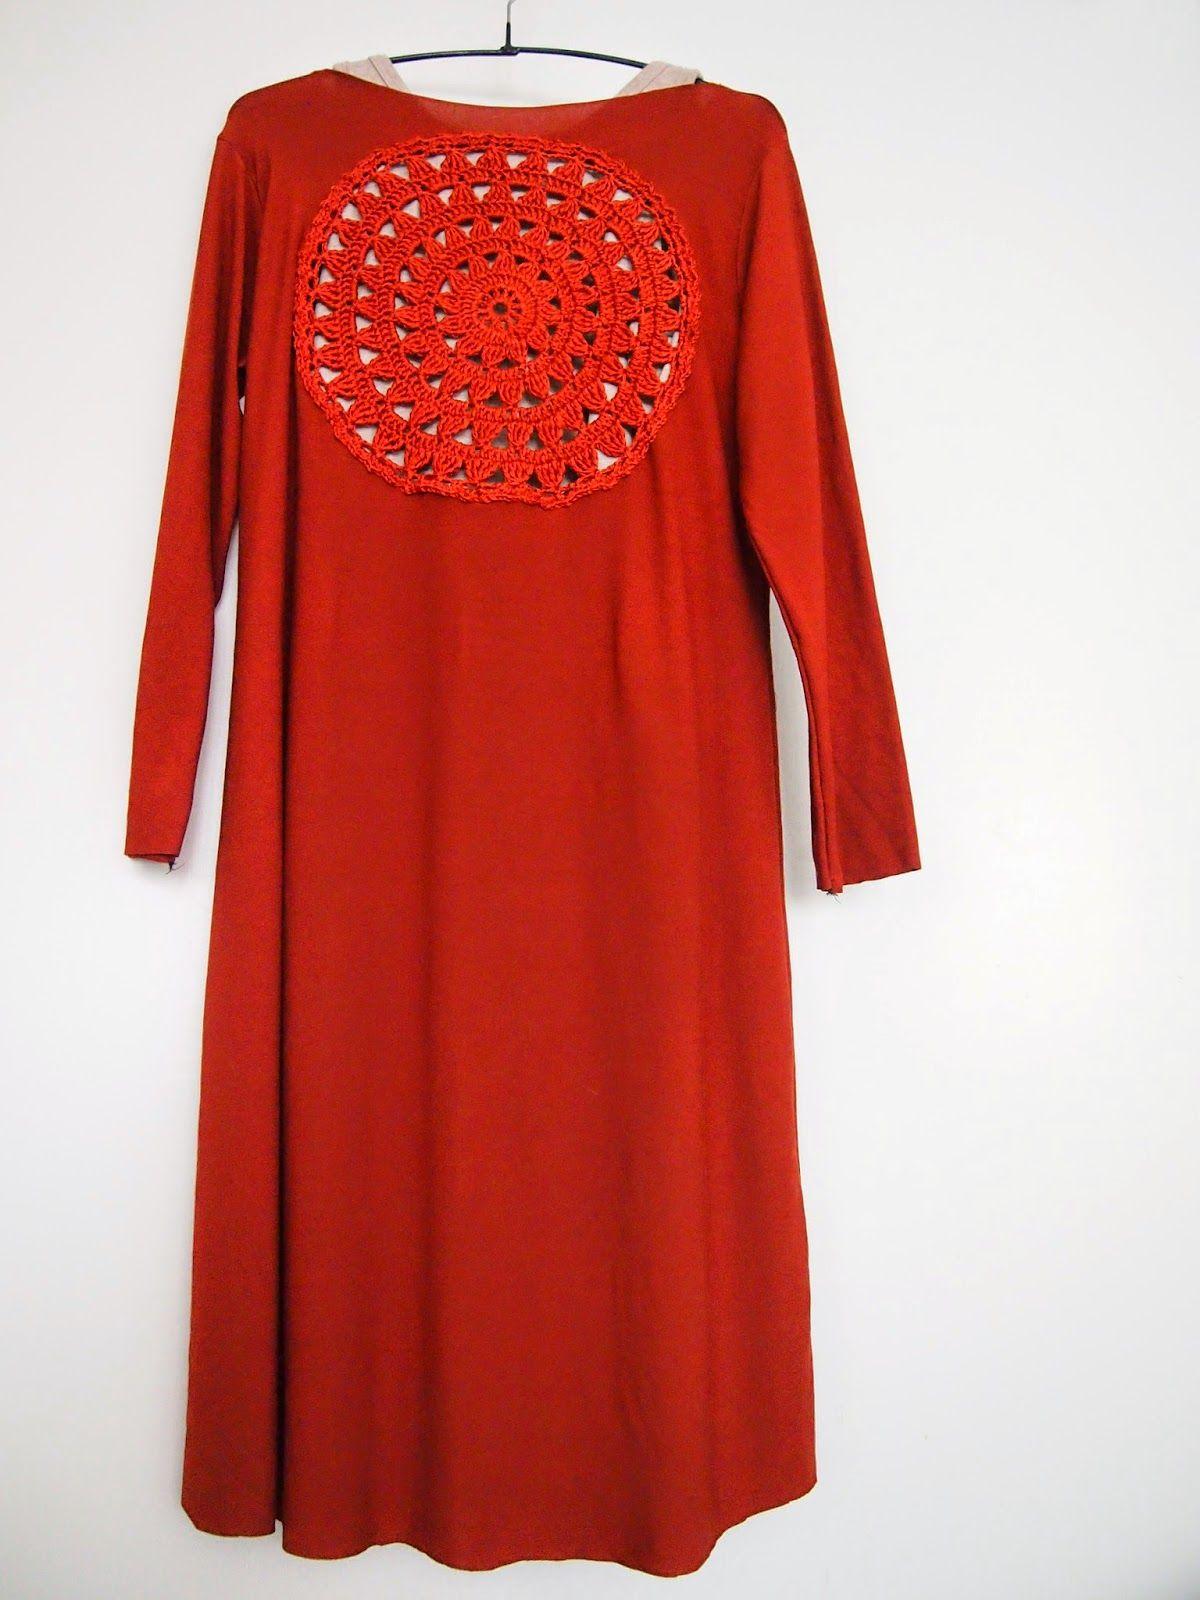 VMSomⒶ KOPPA: Kukkaympyrällä op smaak gebracht met terracotta gebreide jurk